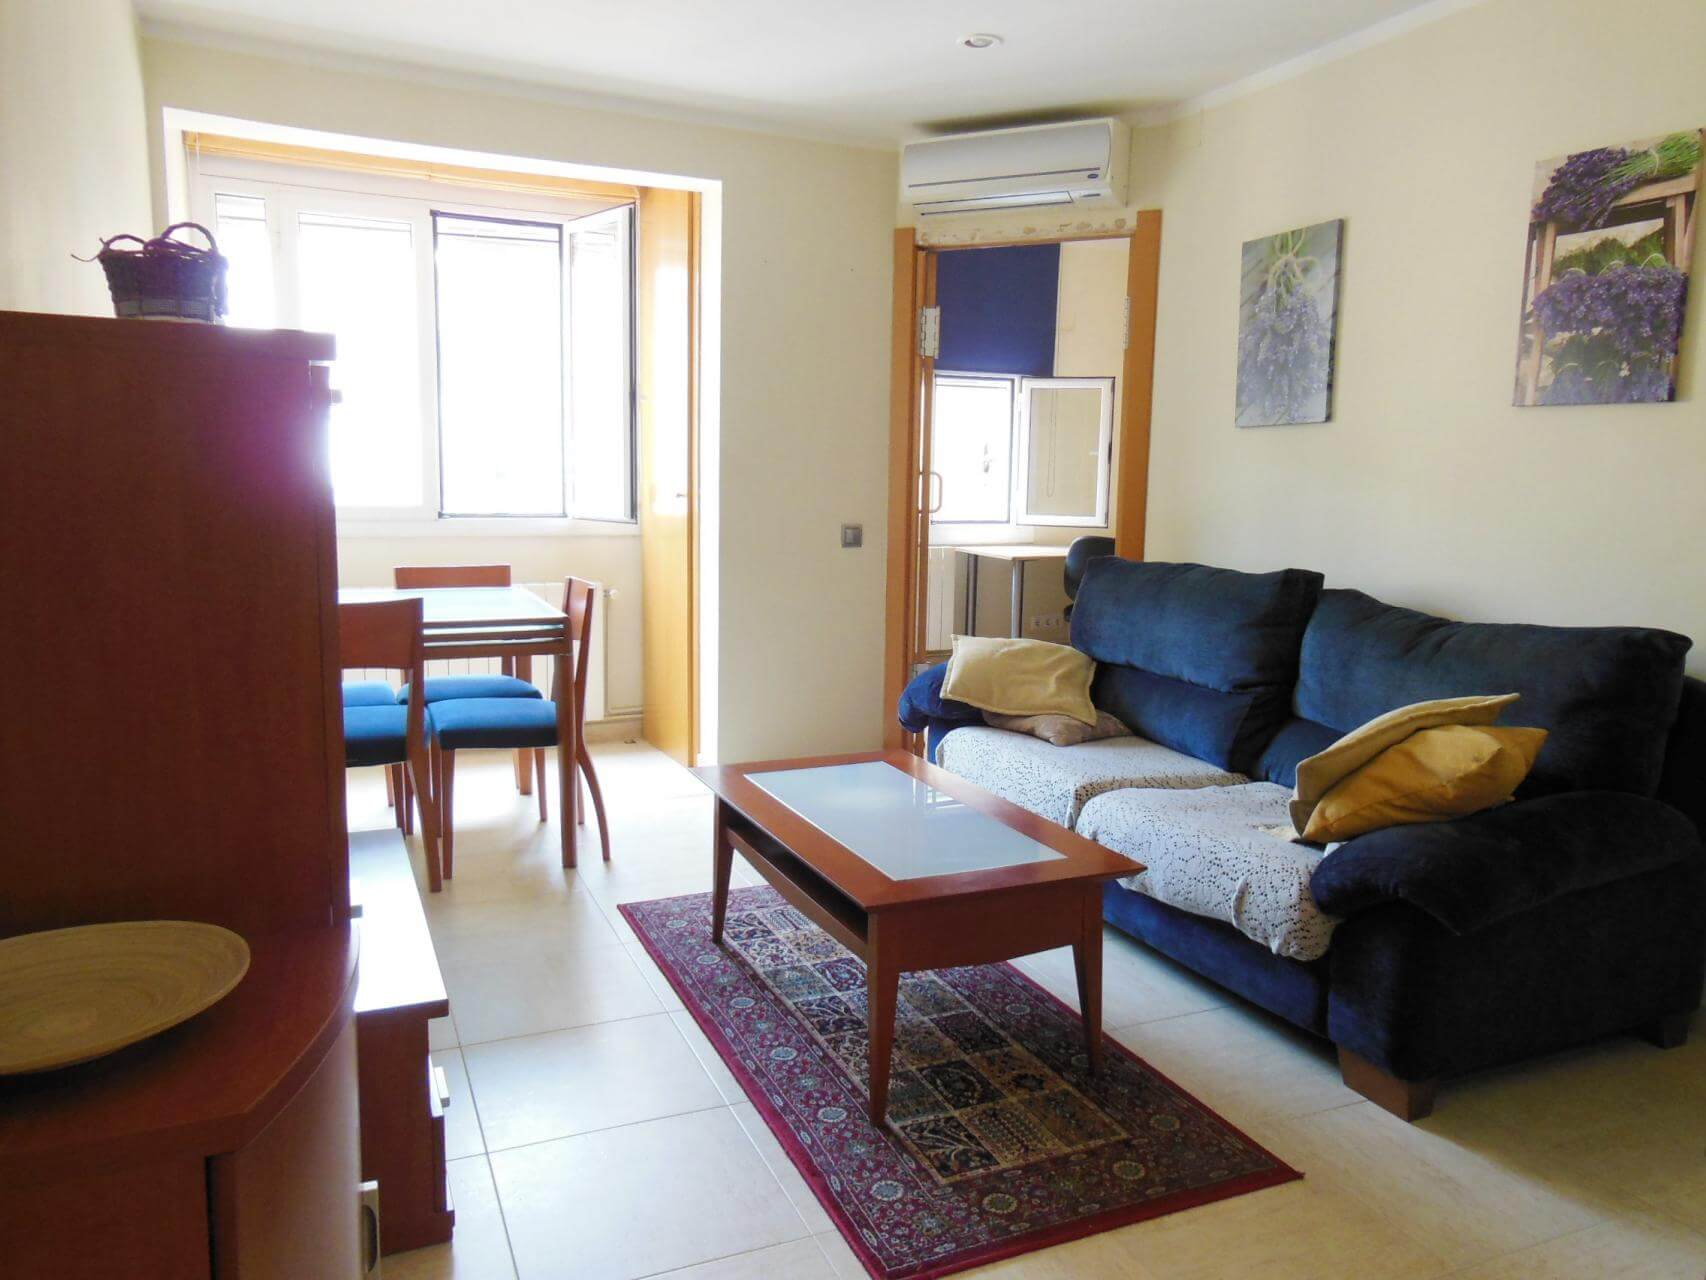 Appartement meubl louer barcelone concepci arenal for Assurance location meuble